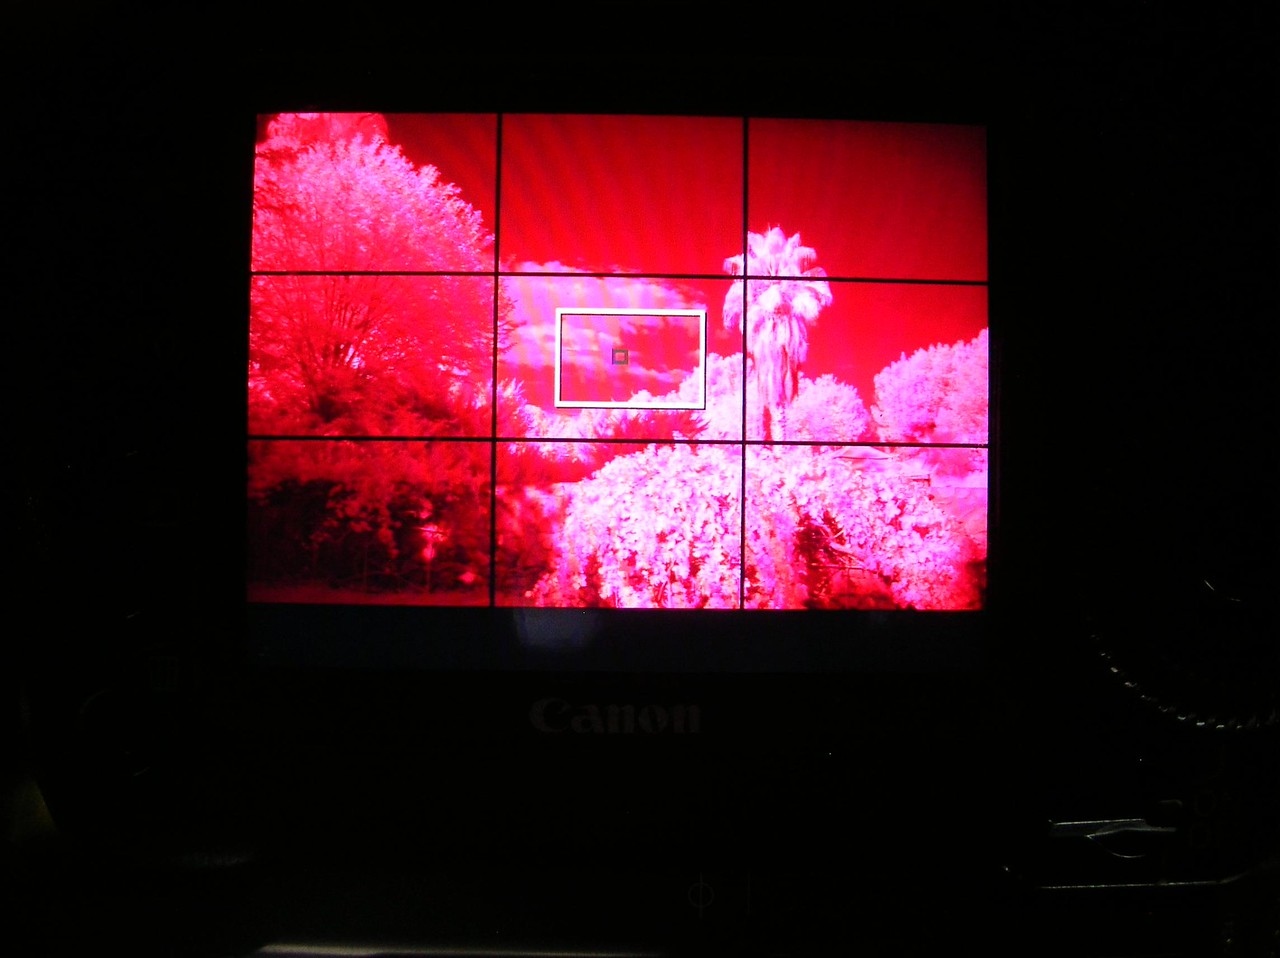 Camera LCD with a Daylight White Balance & 740nm